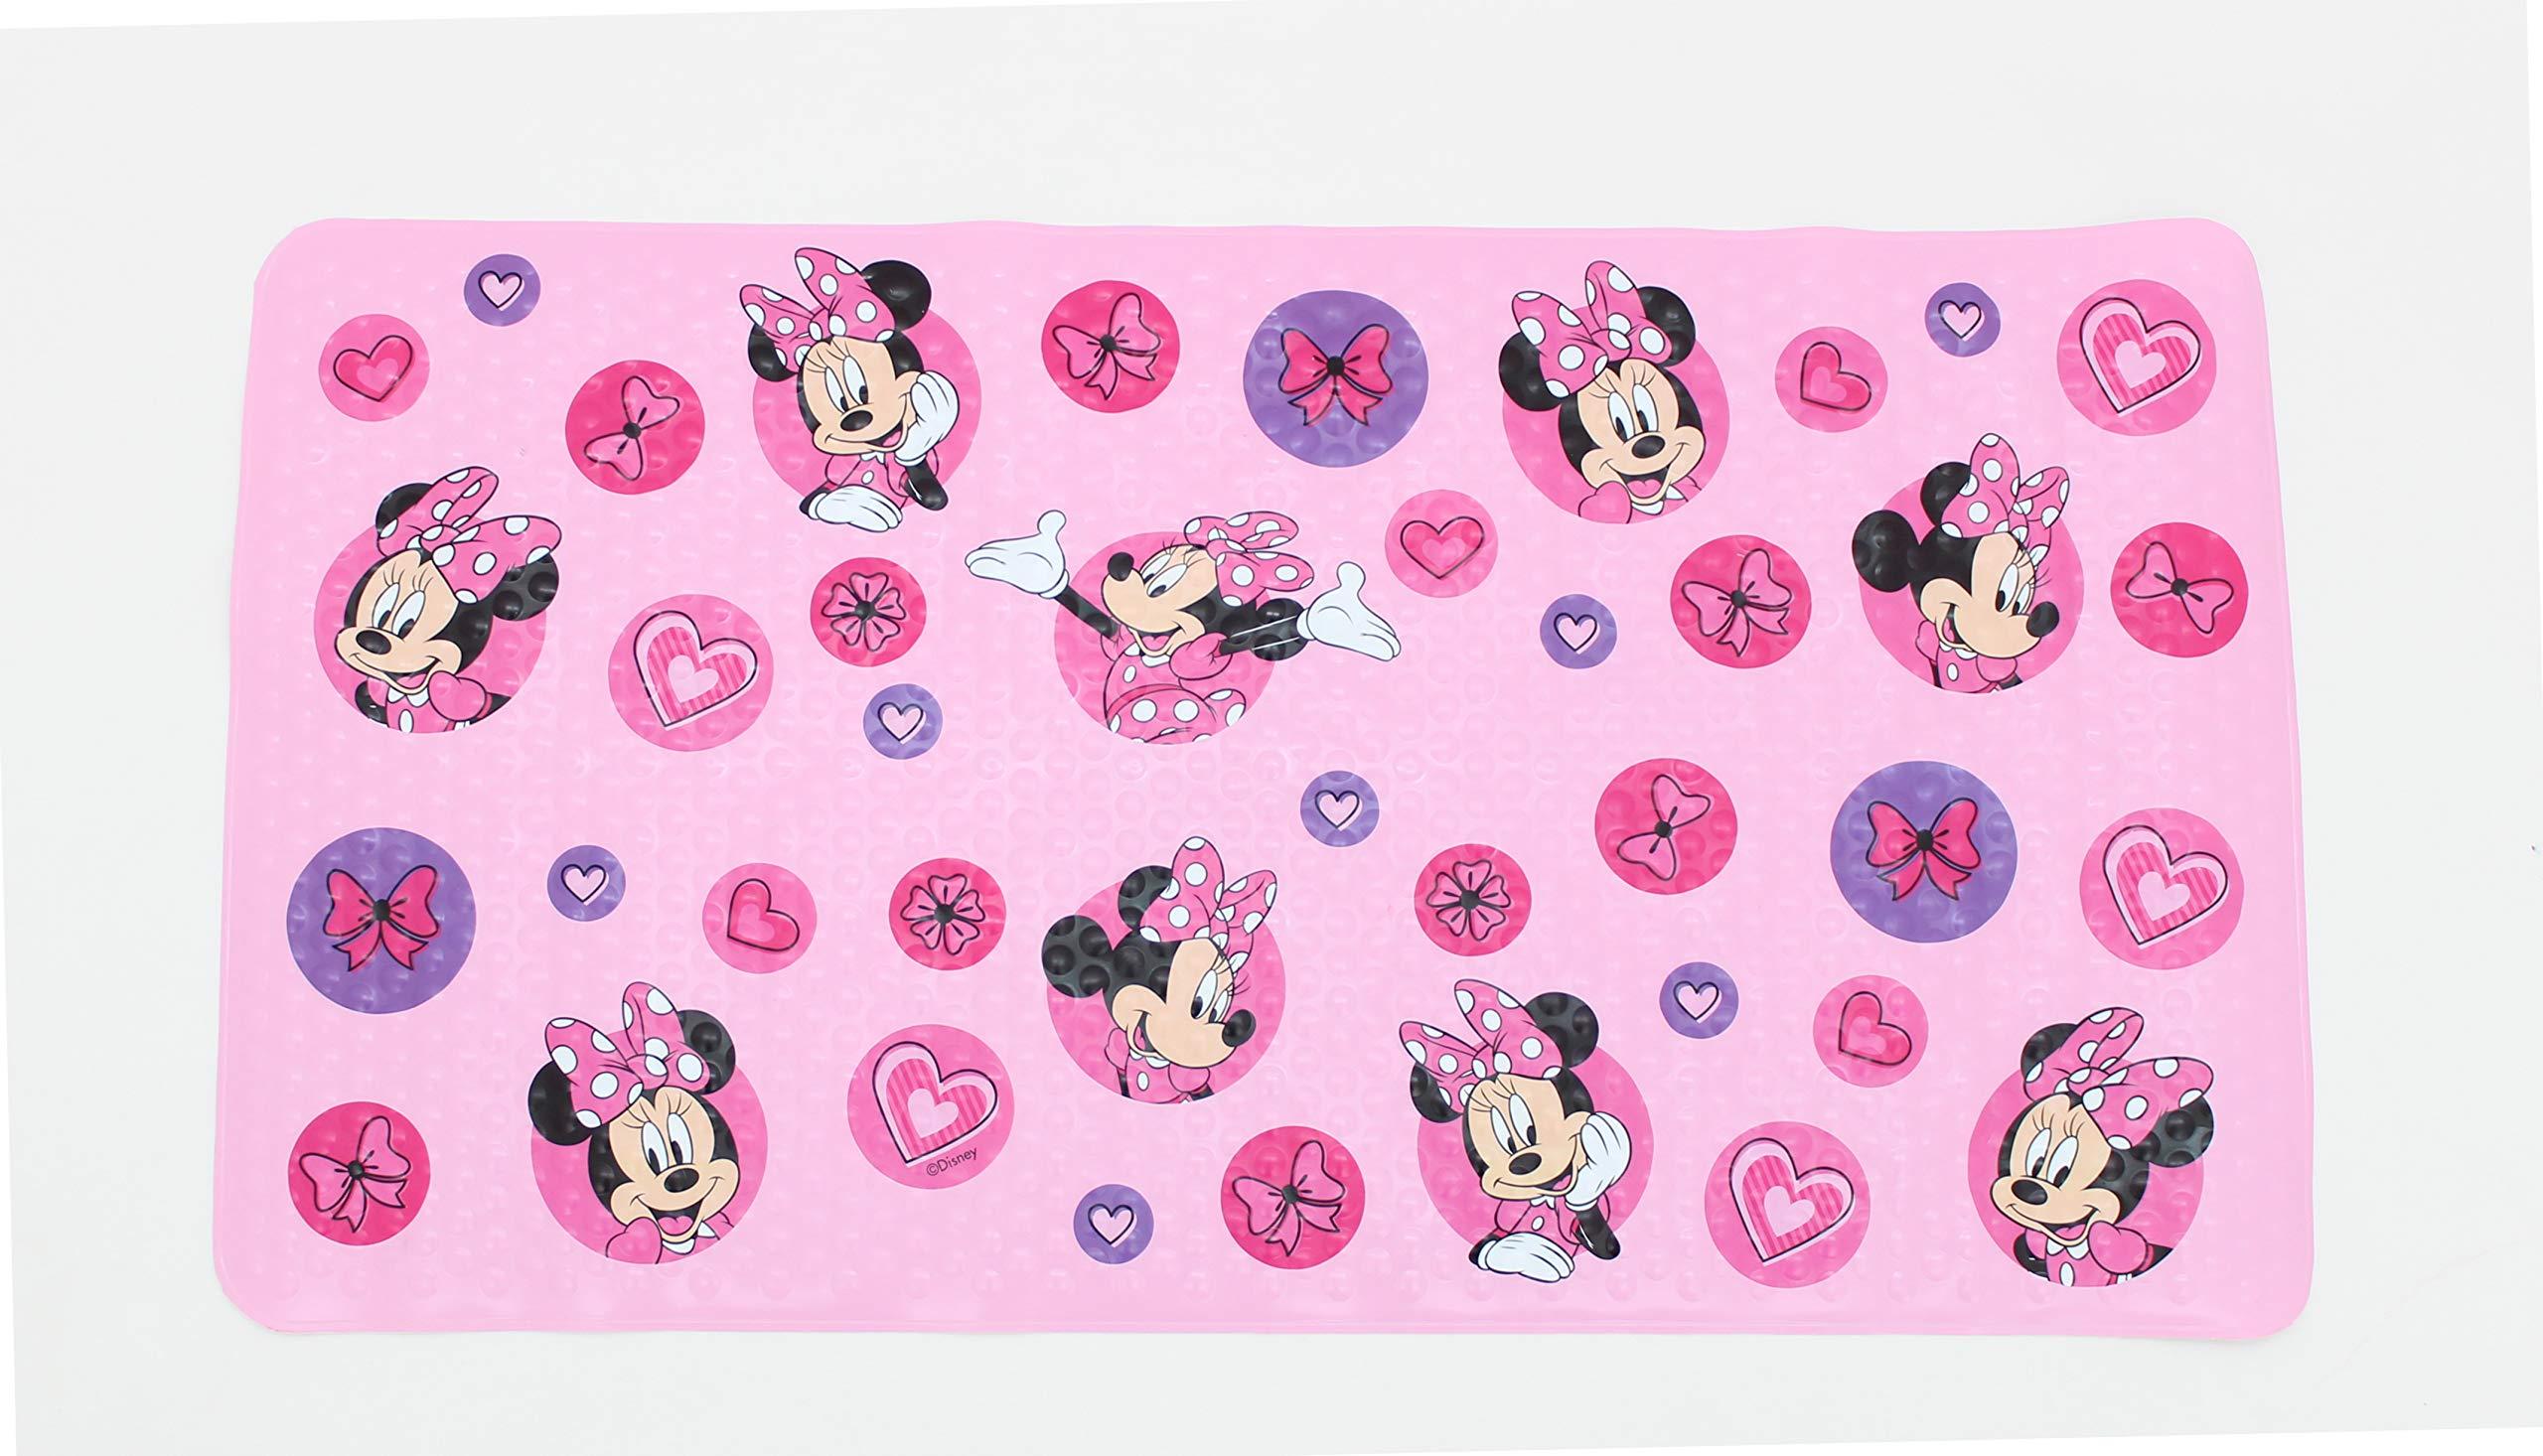 Disney Minnie Mouse Pink Bath Tub Mat - Kids Bath Mat by Ginsey (Image #1)